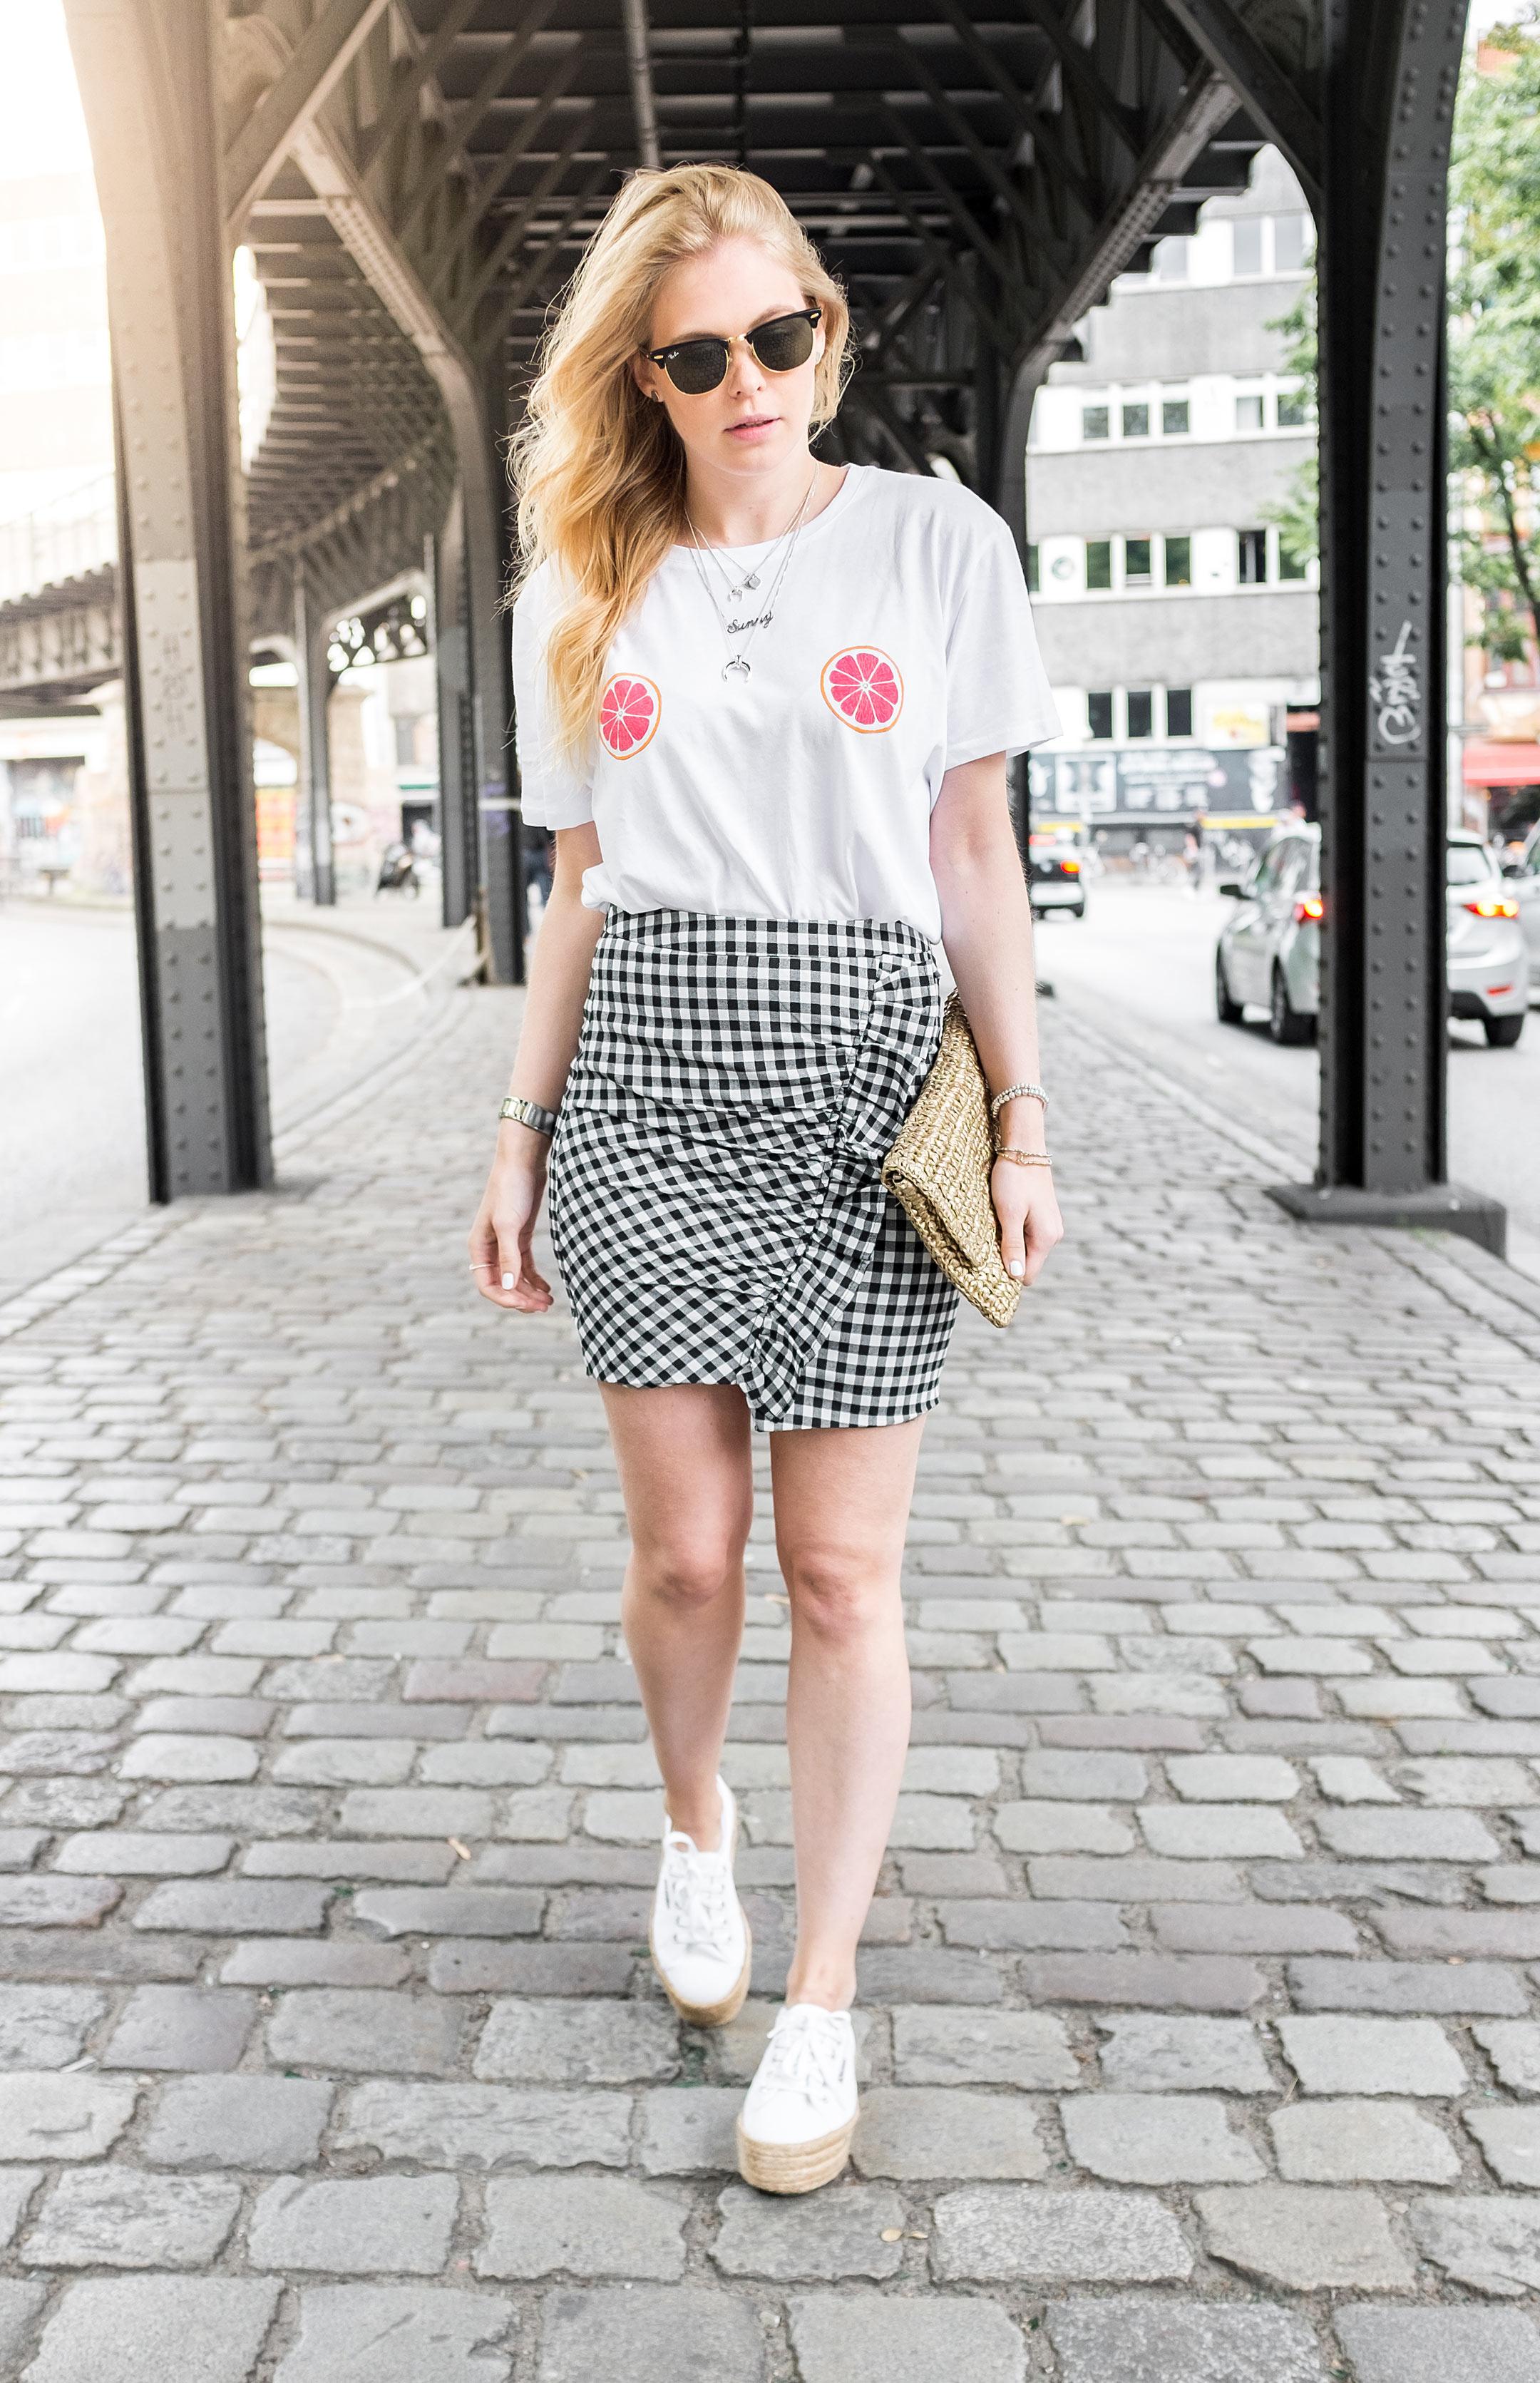 Karorock Basttasche Superga Sneakerdrilles Outfit Fashion Blog Düsseldorf Sunnyinga